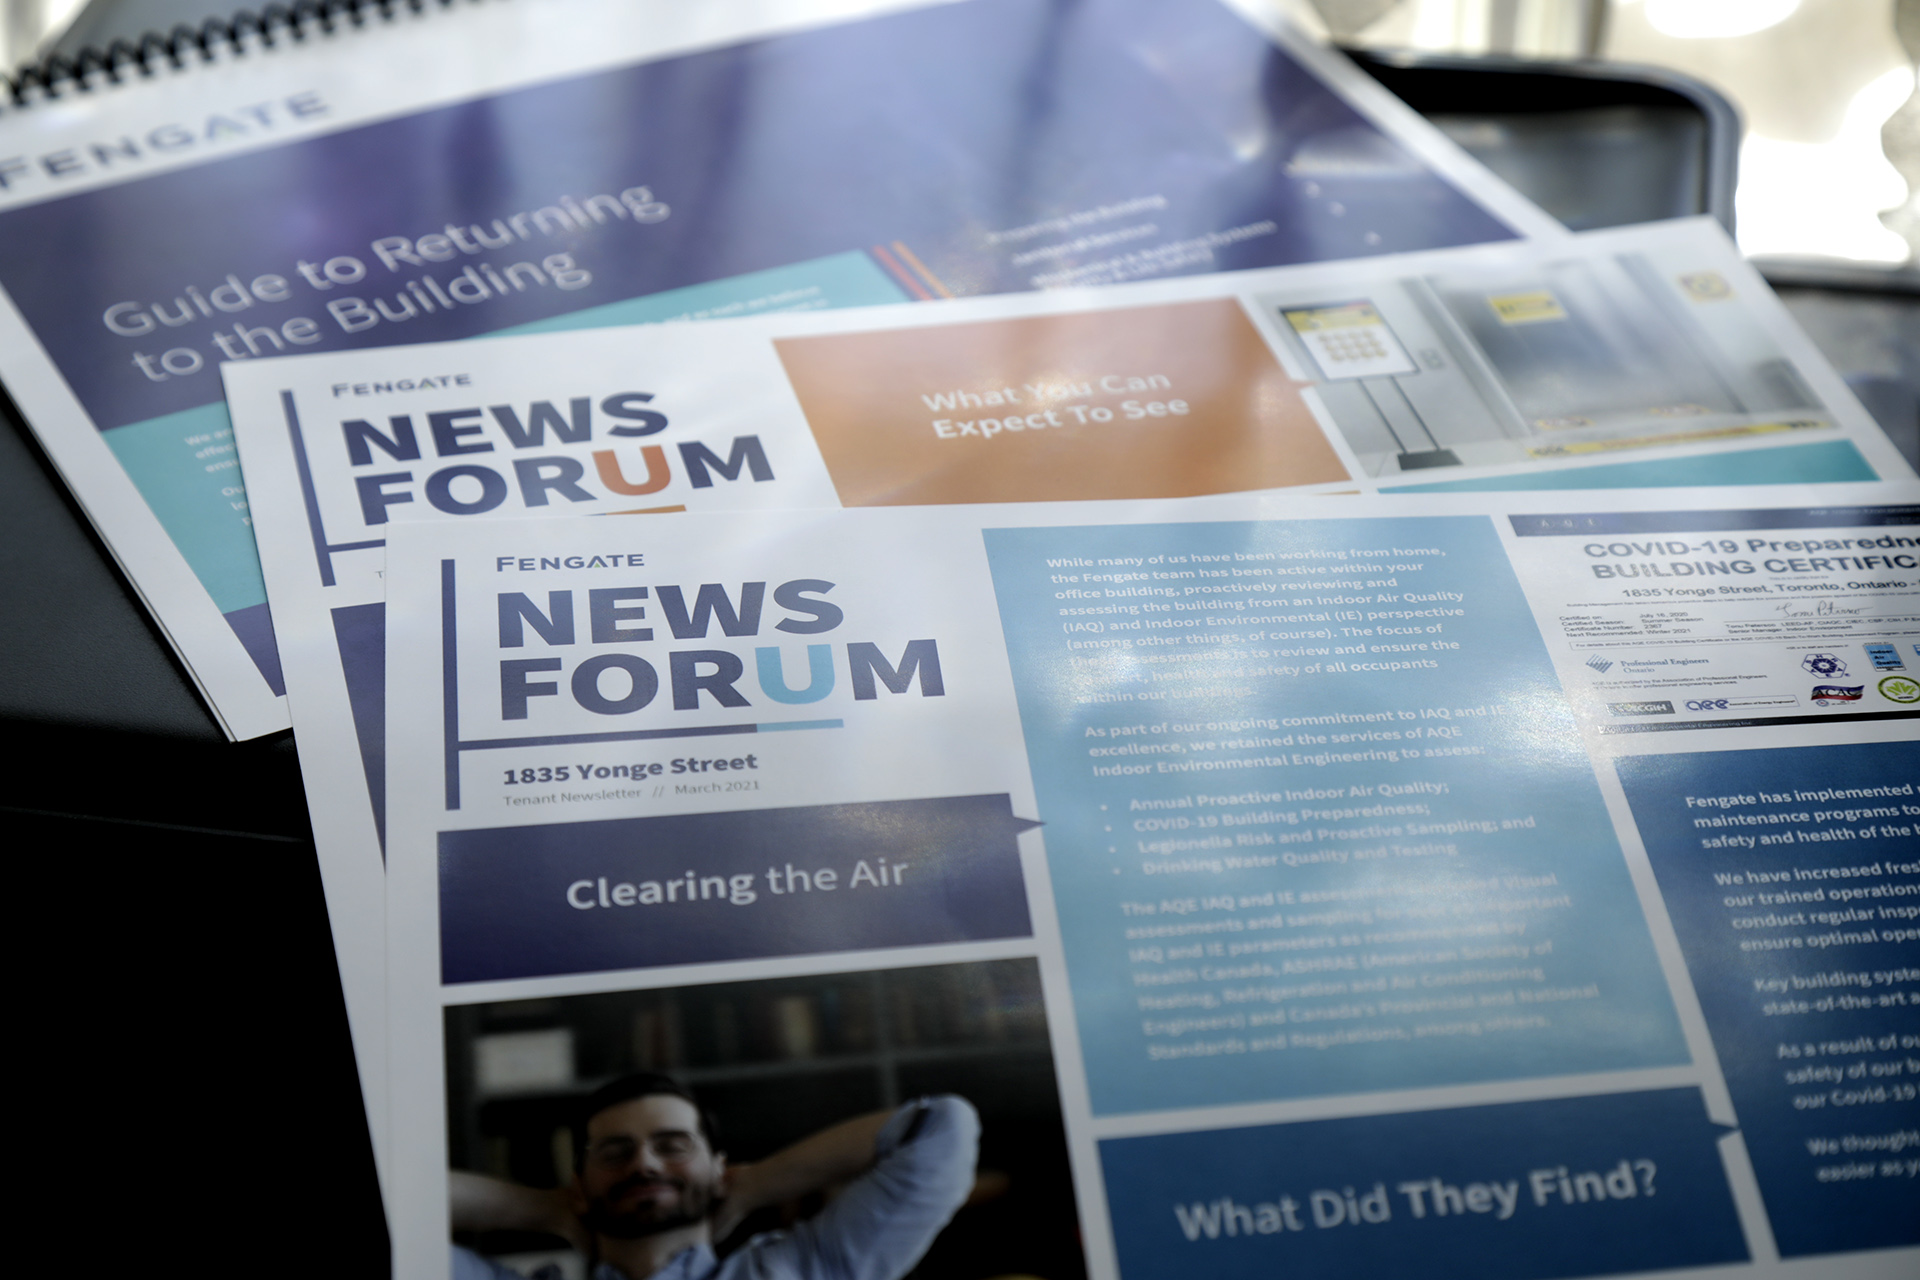 Fengate :: News Forum